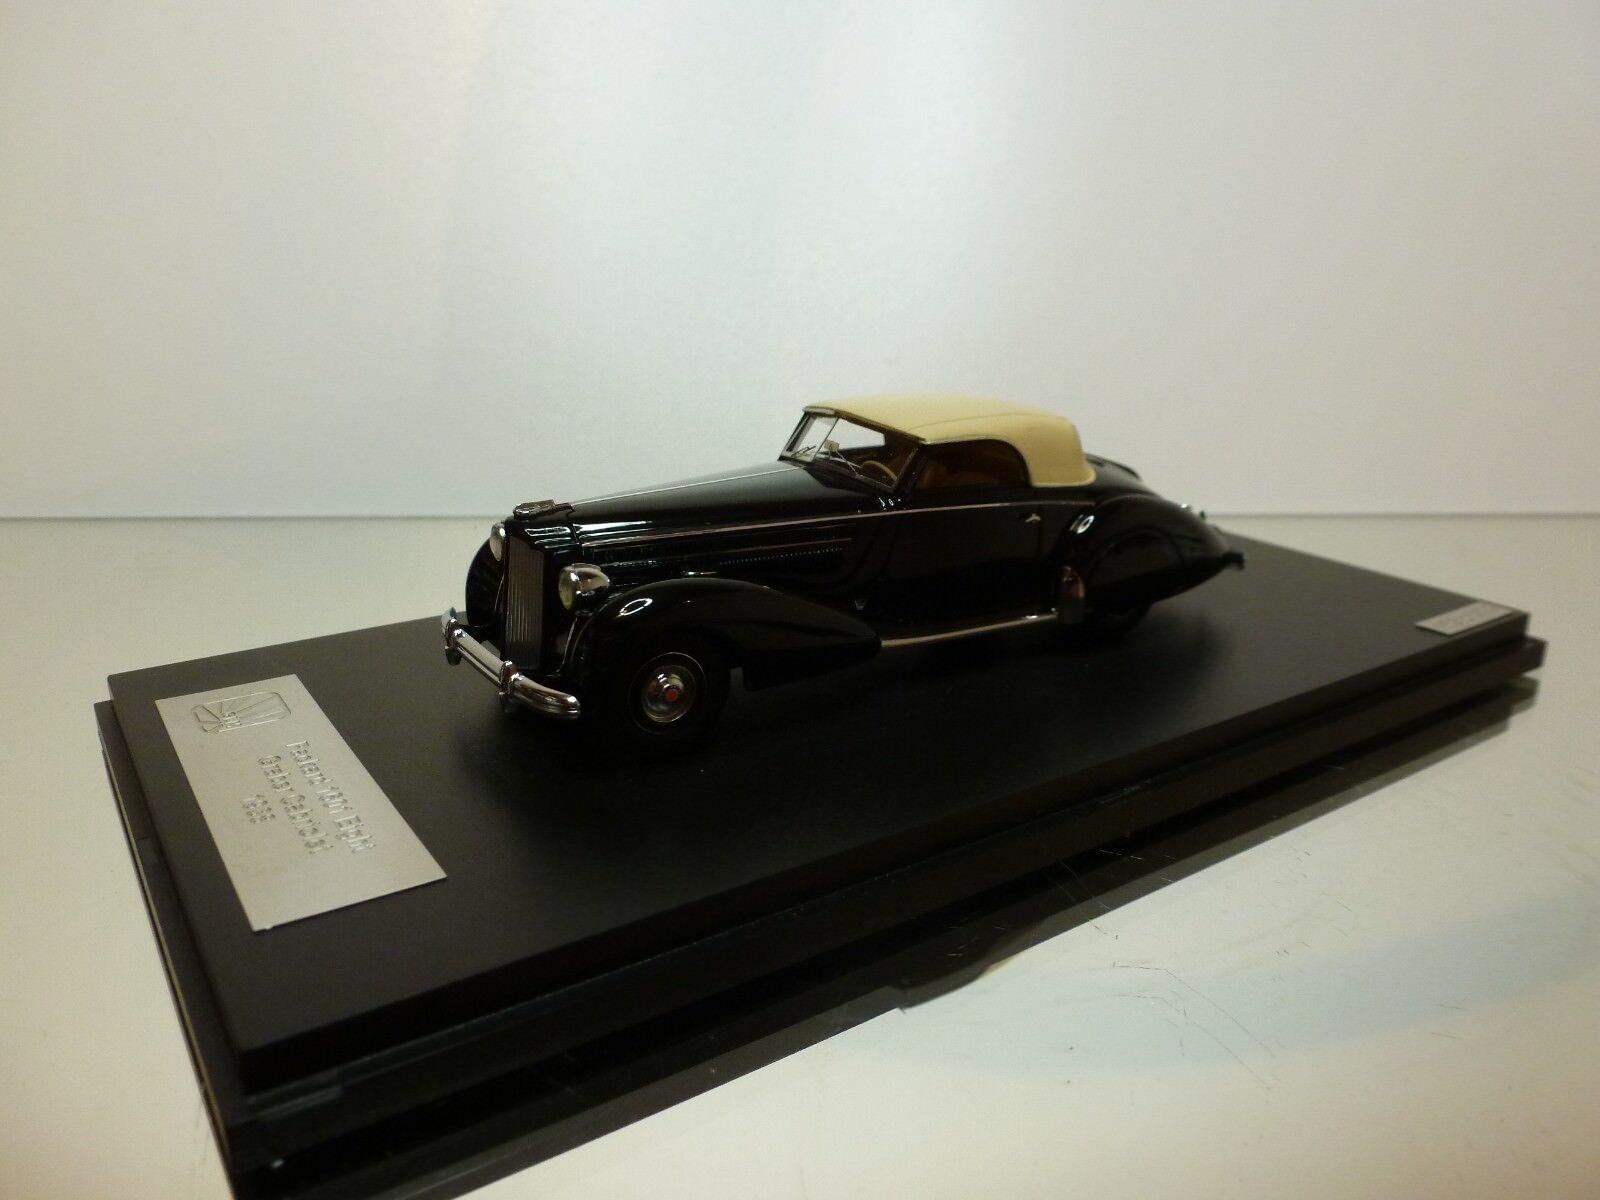 GLM VerpackungARD 1601 EIGHT GRABER CABRIOLET 1938 - schwarz 1 43 - EXCELLENT - 45 40